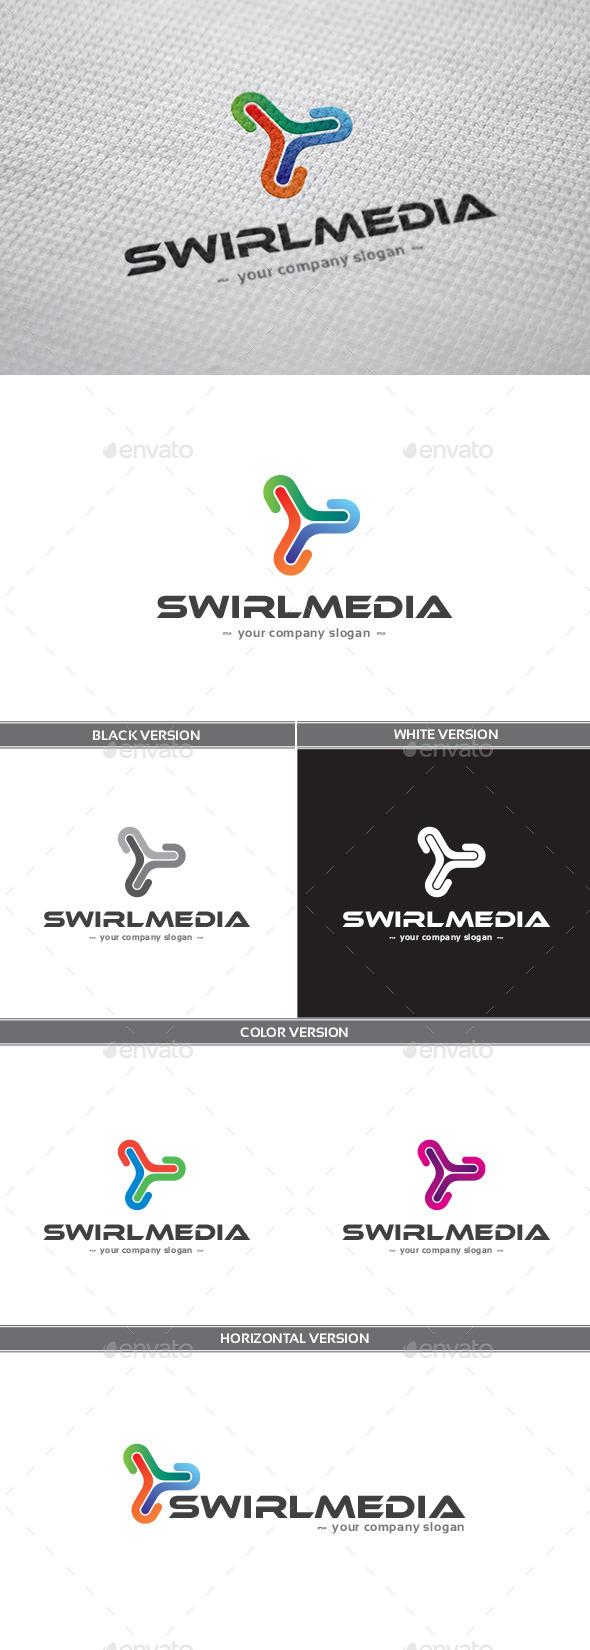 GraphicRiver Swirlmedia Logo 9256976